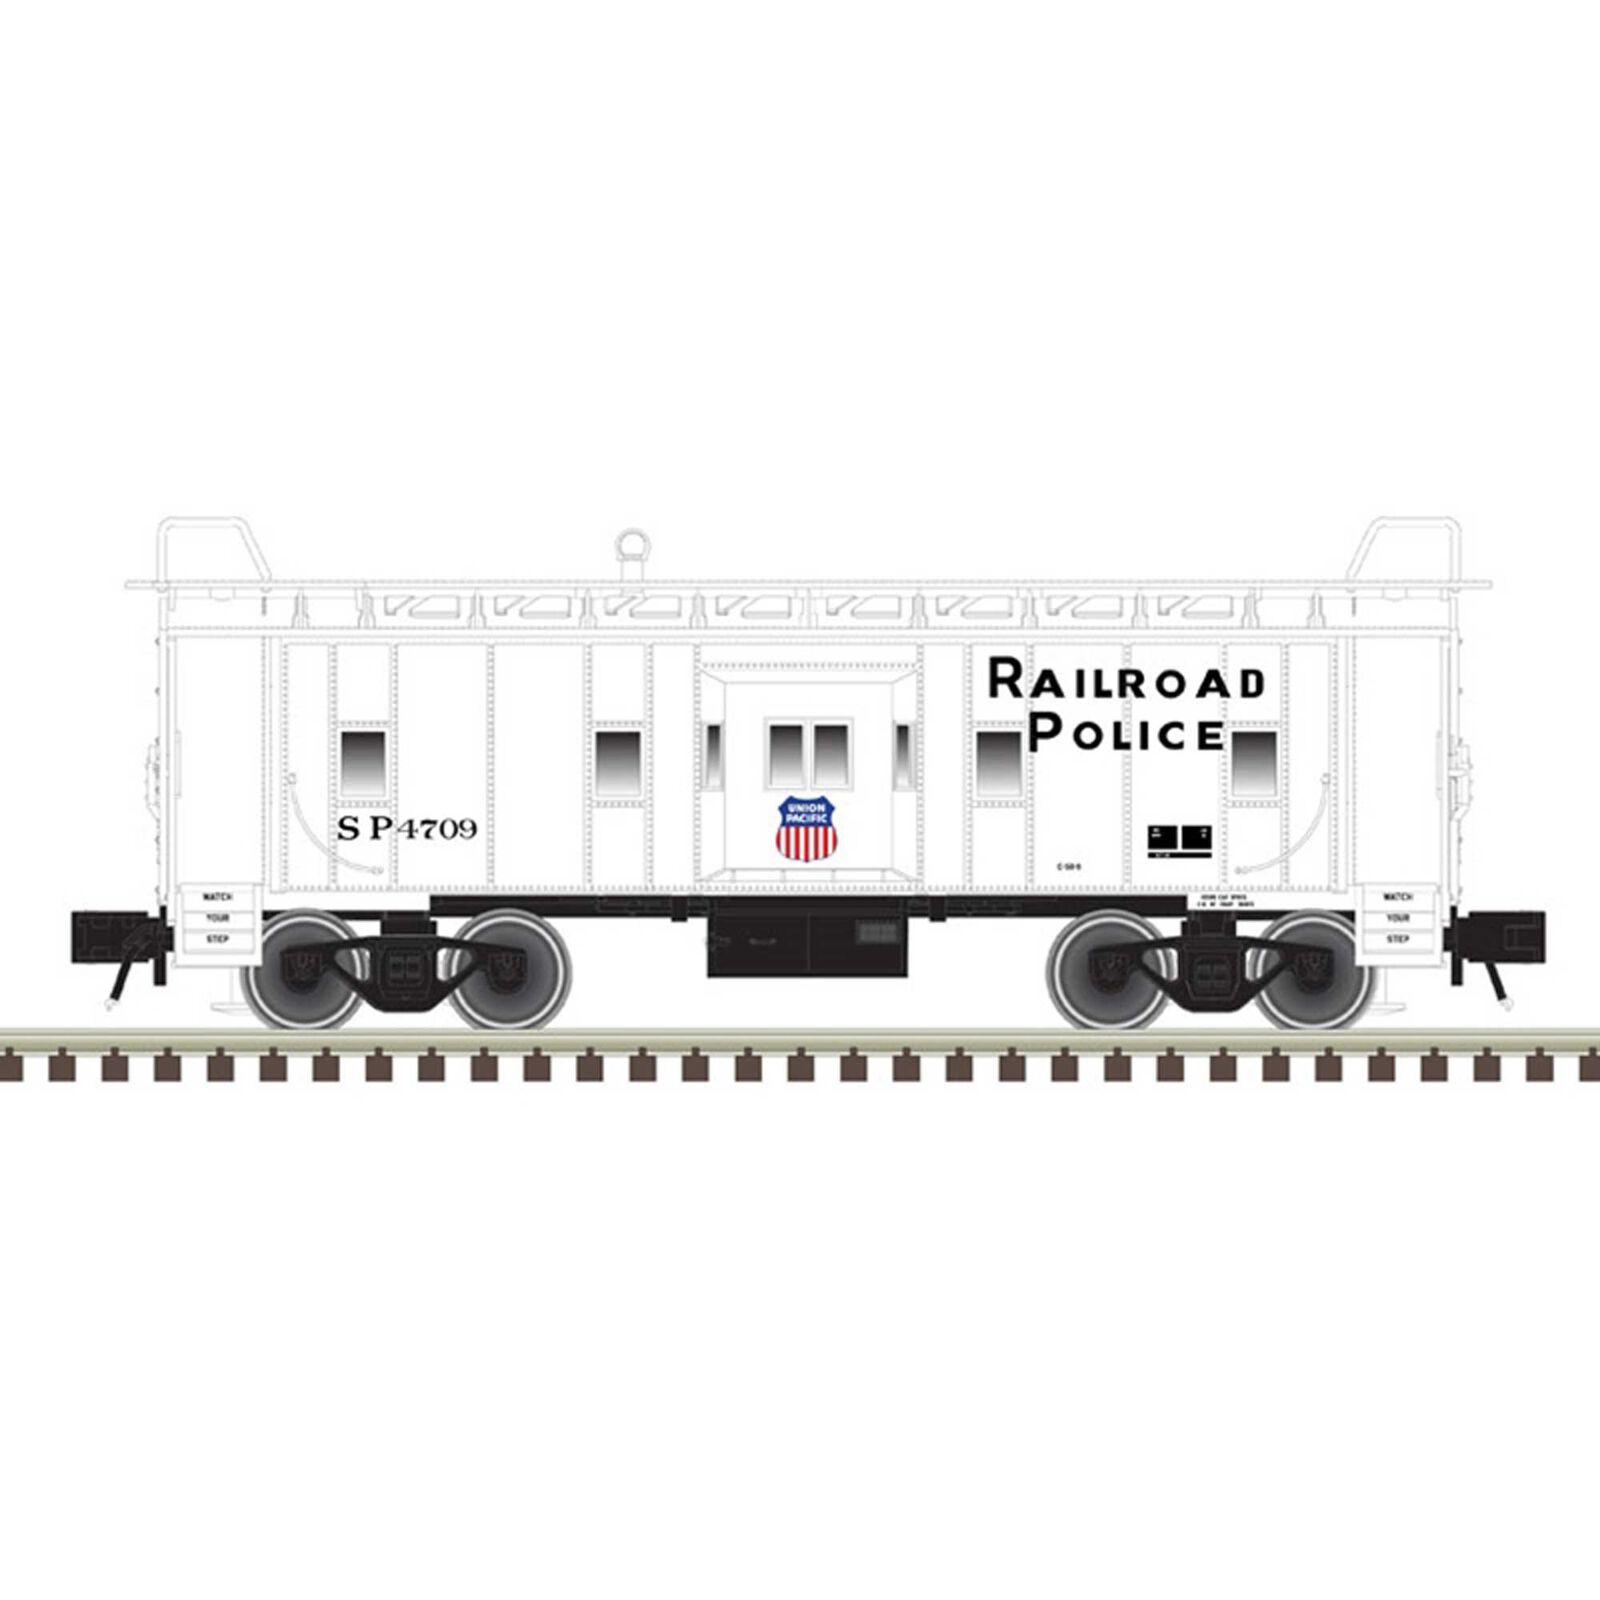 O Bay Window Caboose UP Railroad Police 4709